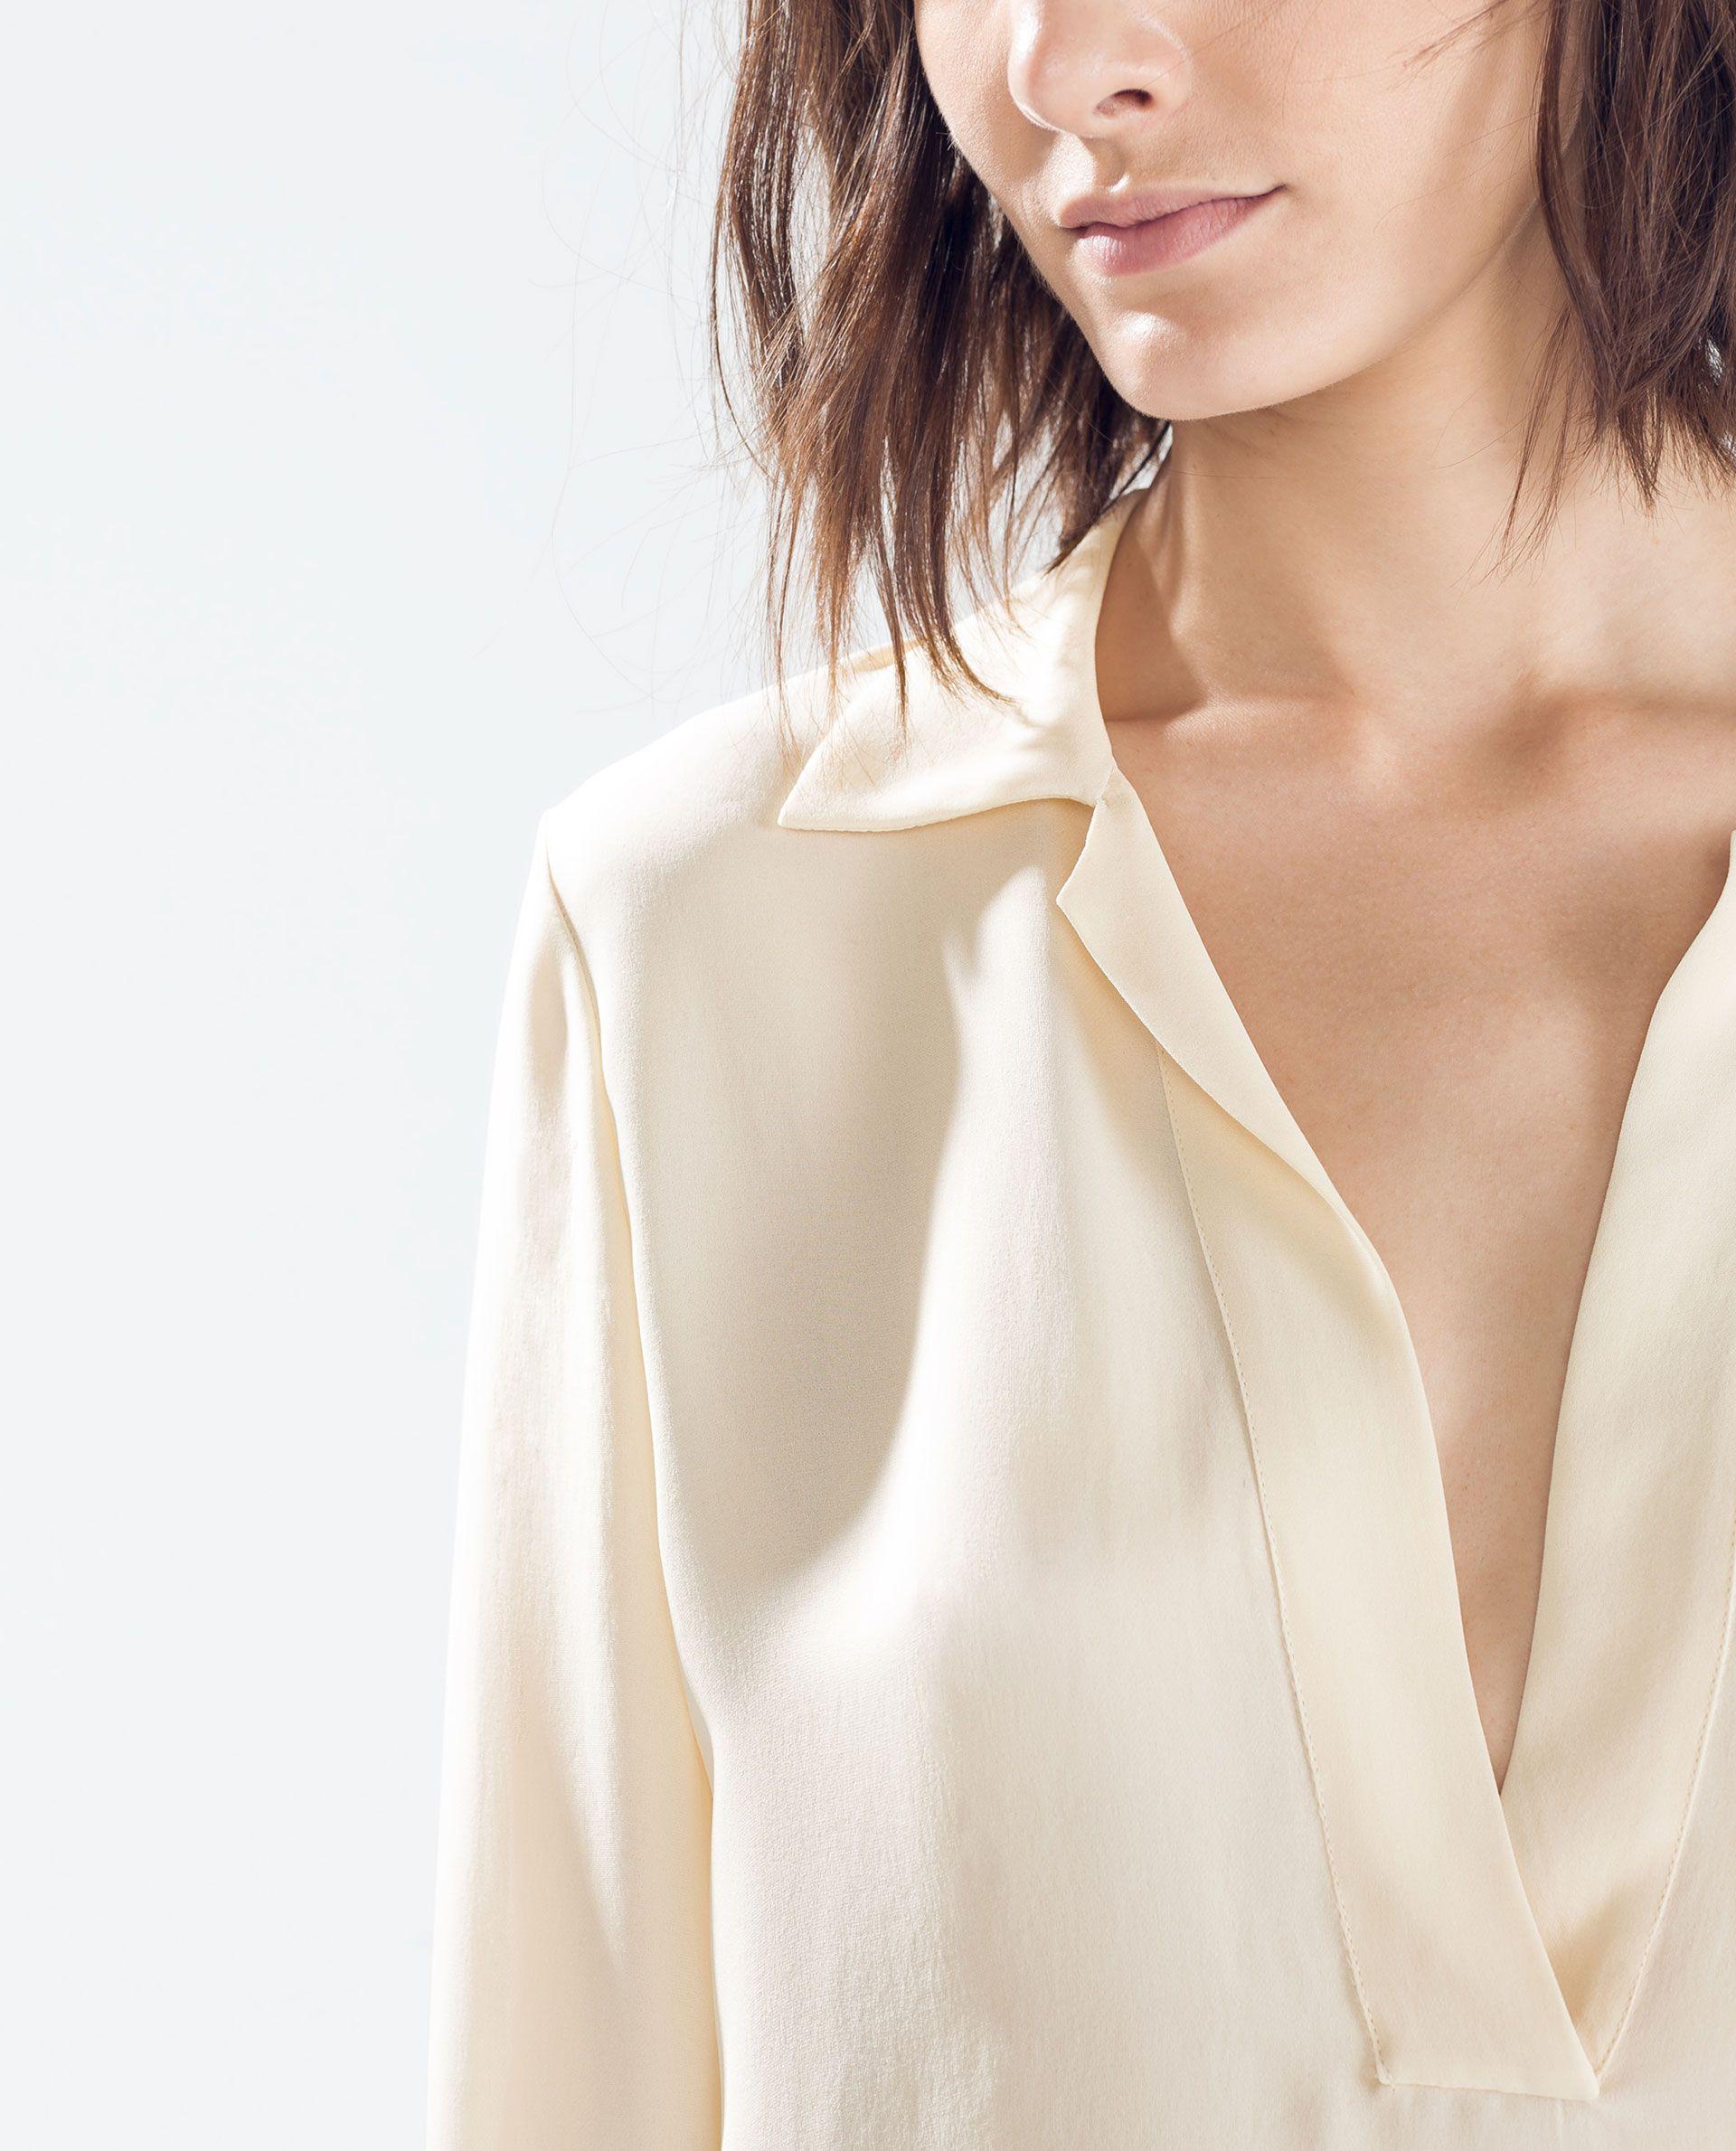 POLO NECK SHIRT from Zara